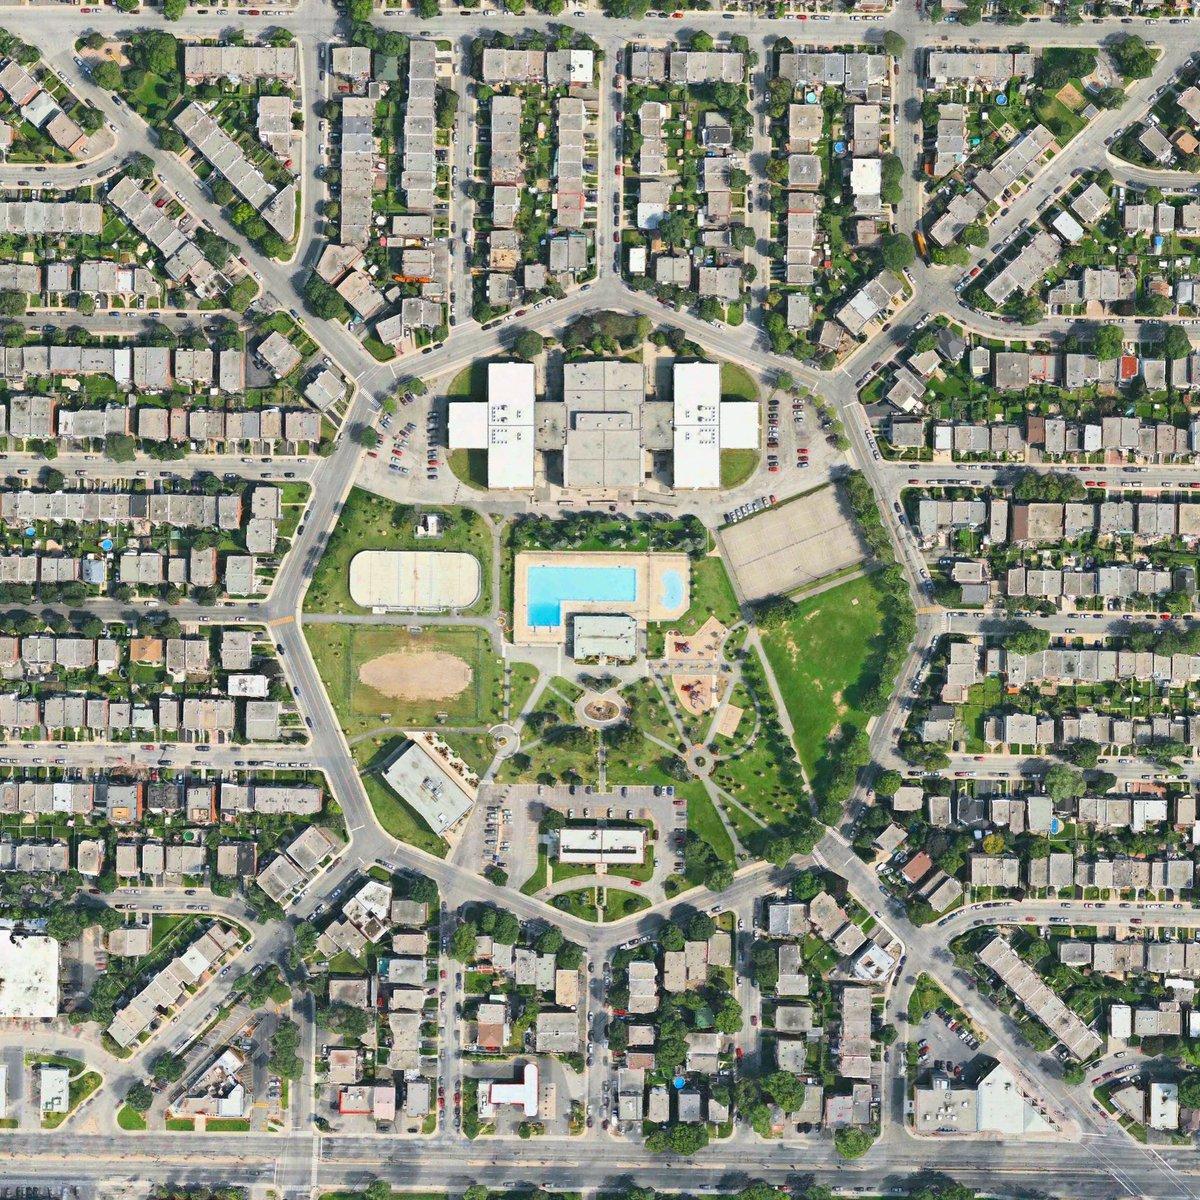 7f063d087b80 World Urban Planning on Twitter